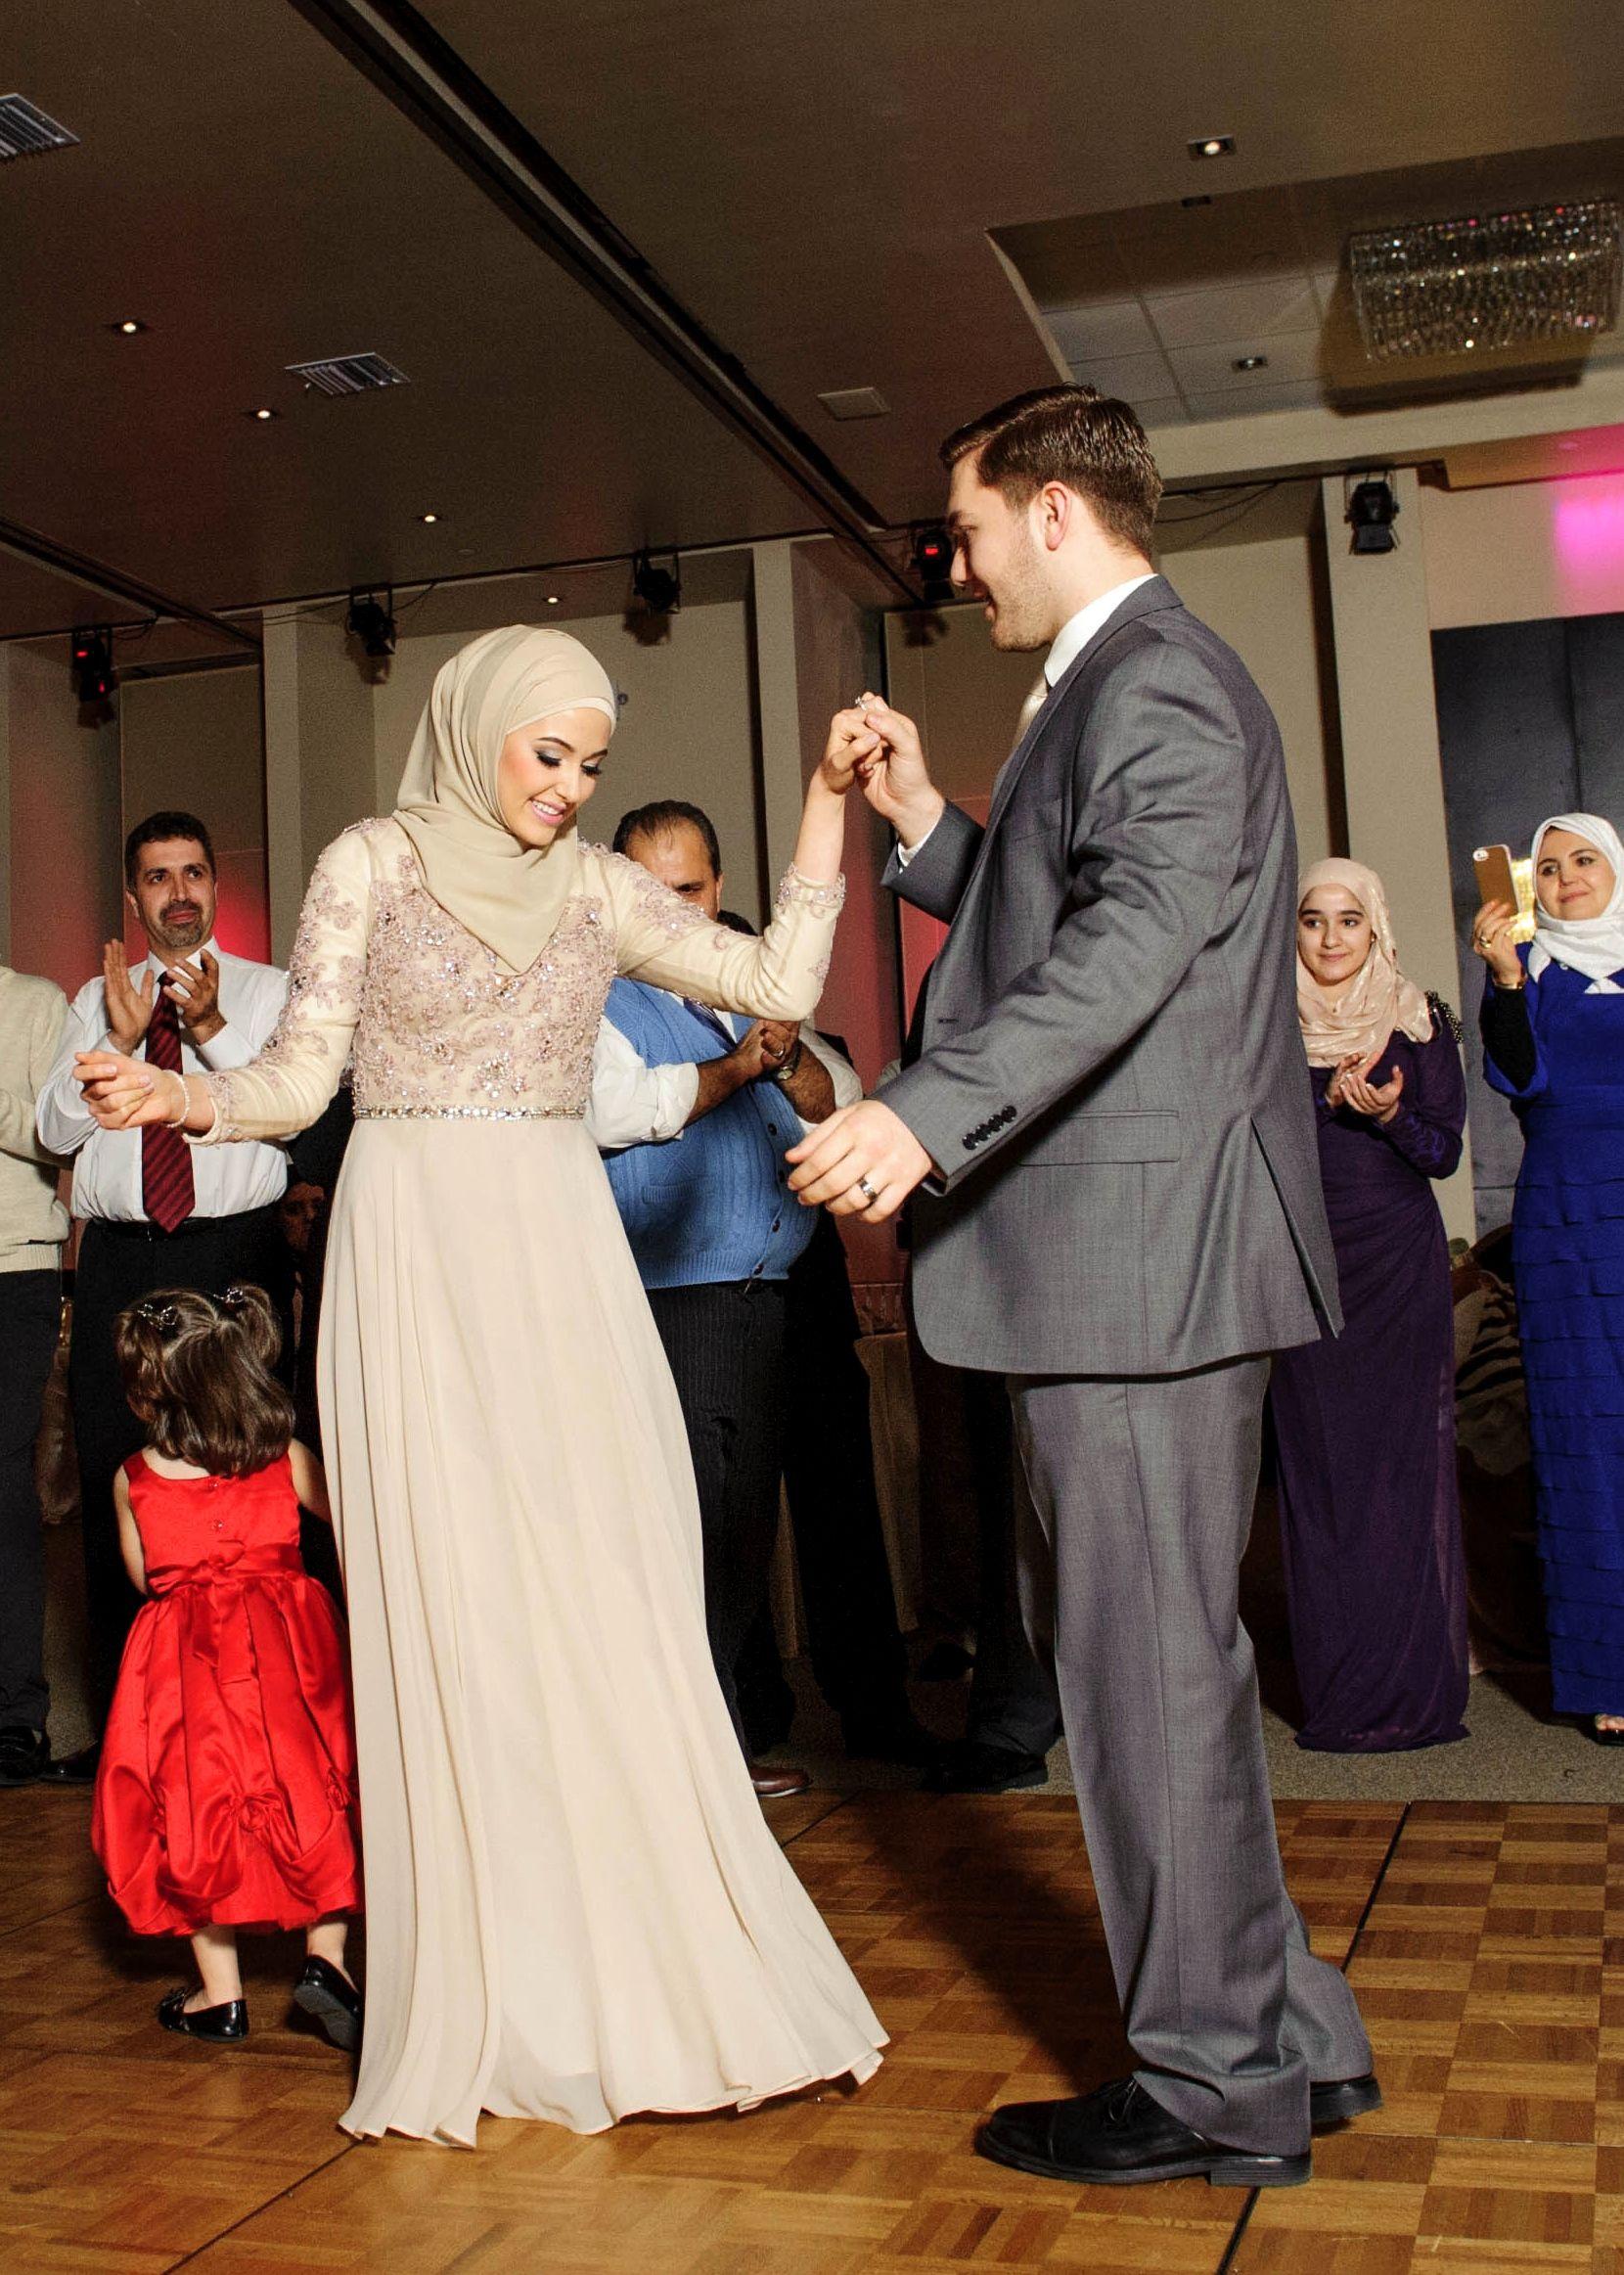 Our Engagement Party Fancy Wedding Dresses Wedding Guest Outfit Summer Wedding Guest Outfit Winter [ 2325 x 1660 Pixel ]